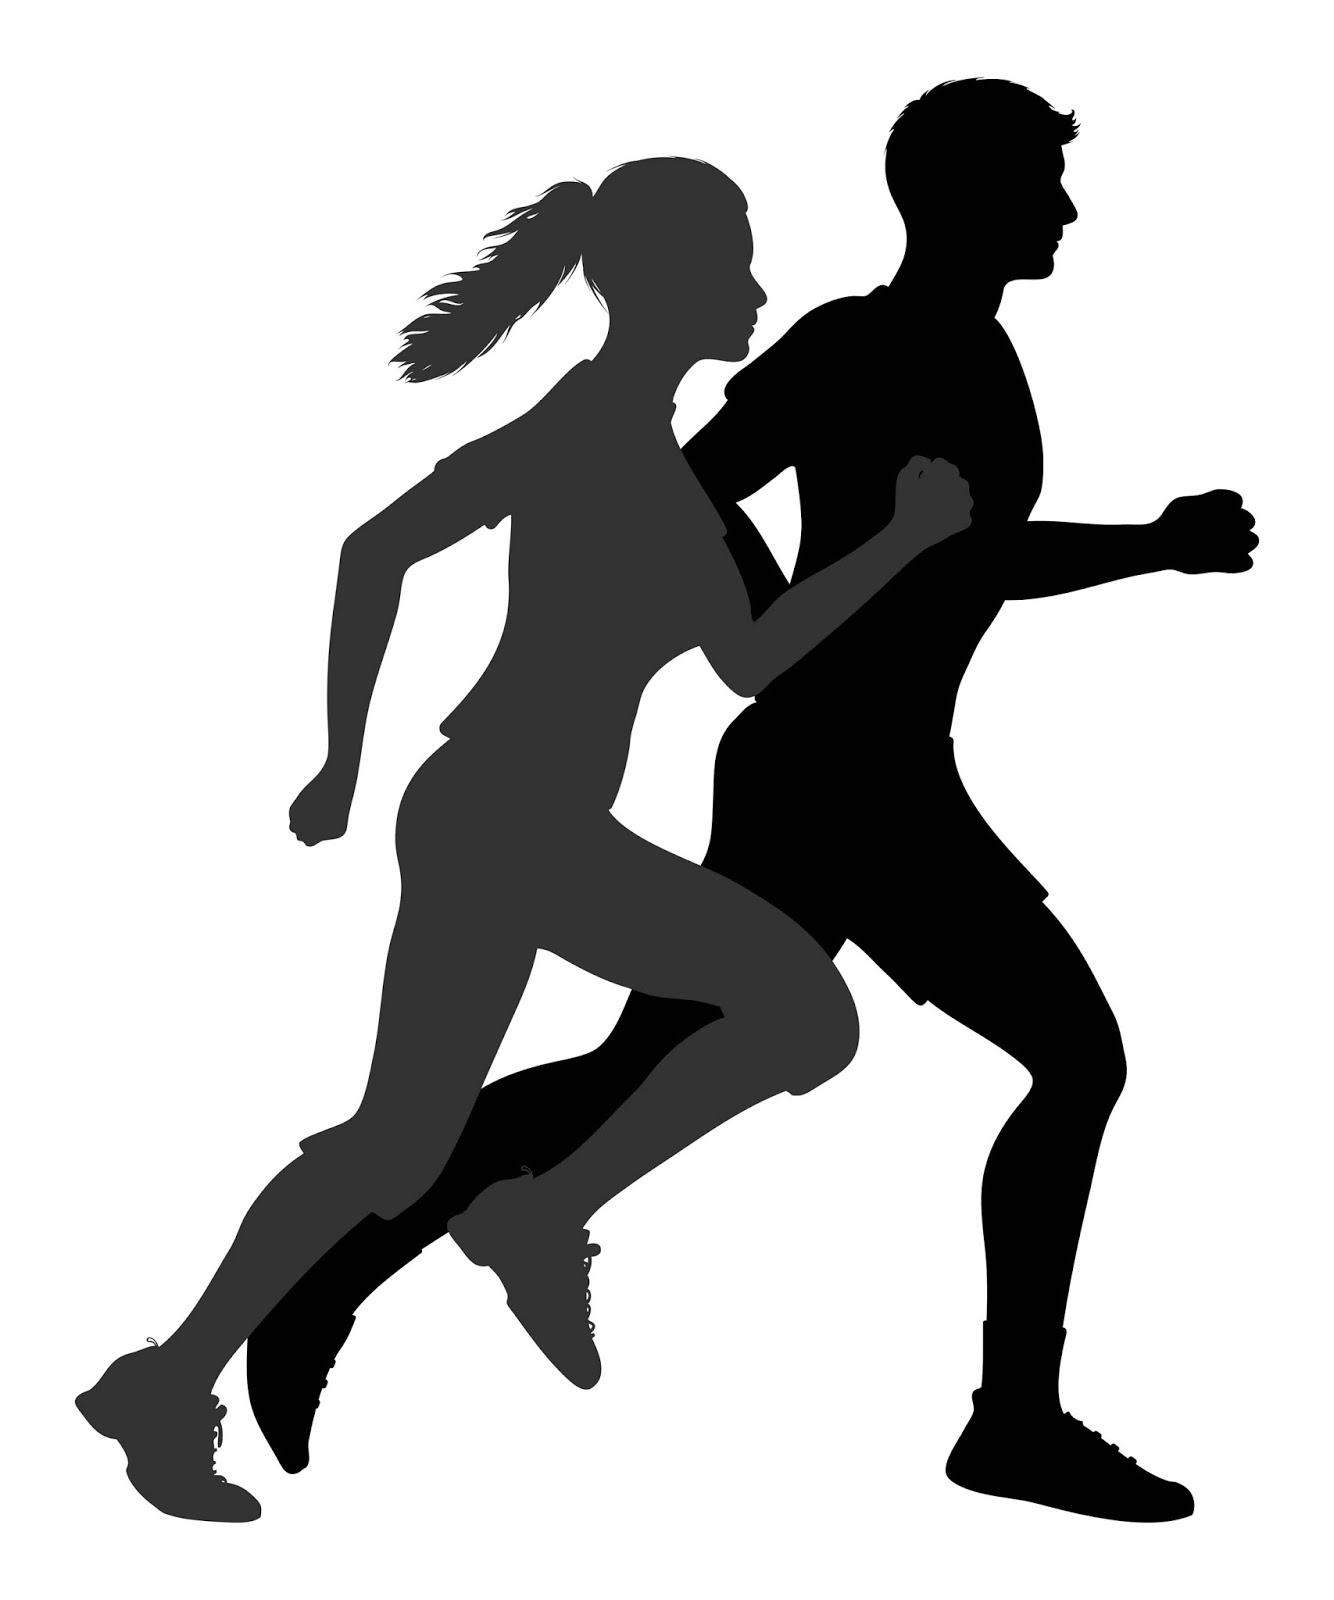 NAHSAG: Four Principles of Cardiovascular Exercise